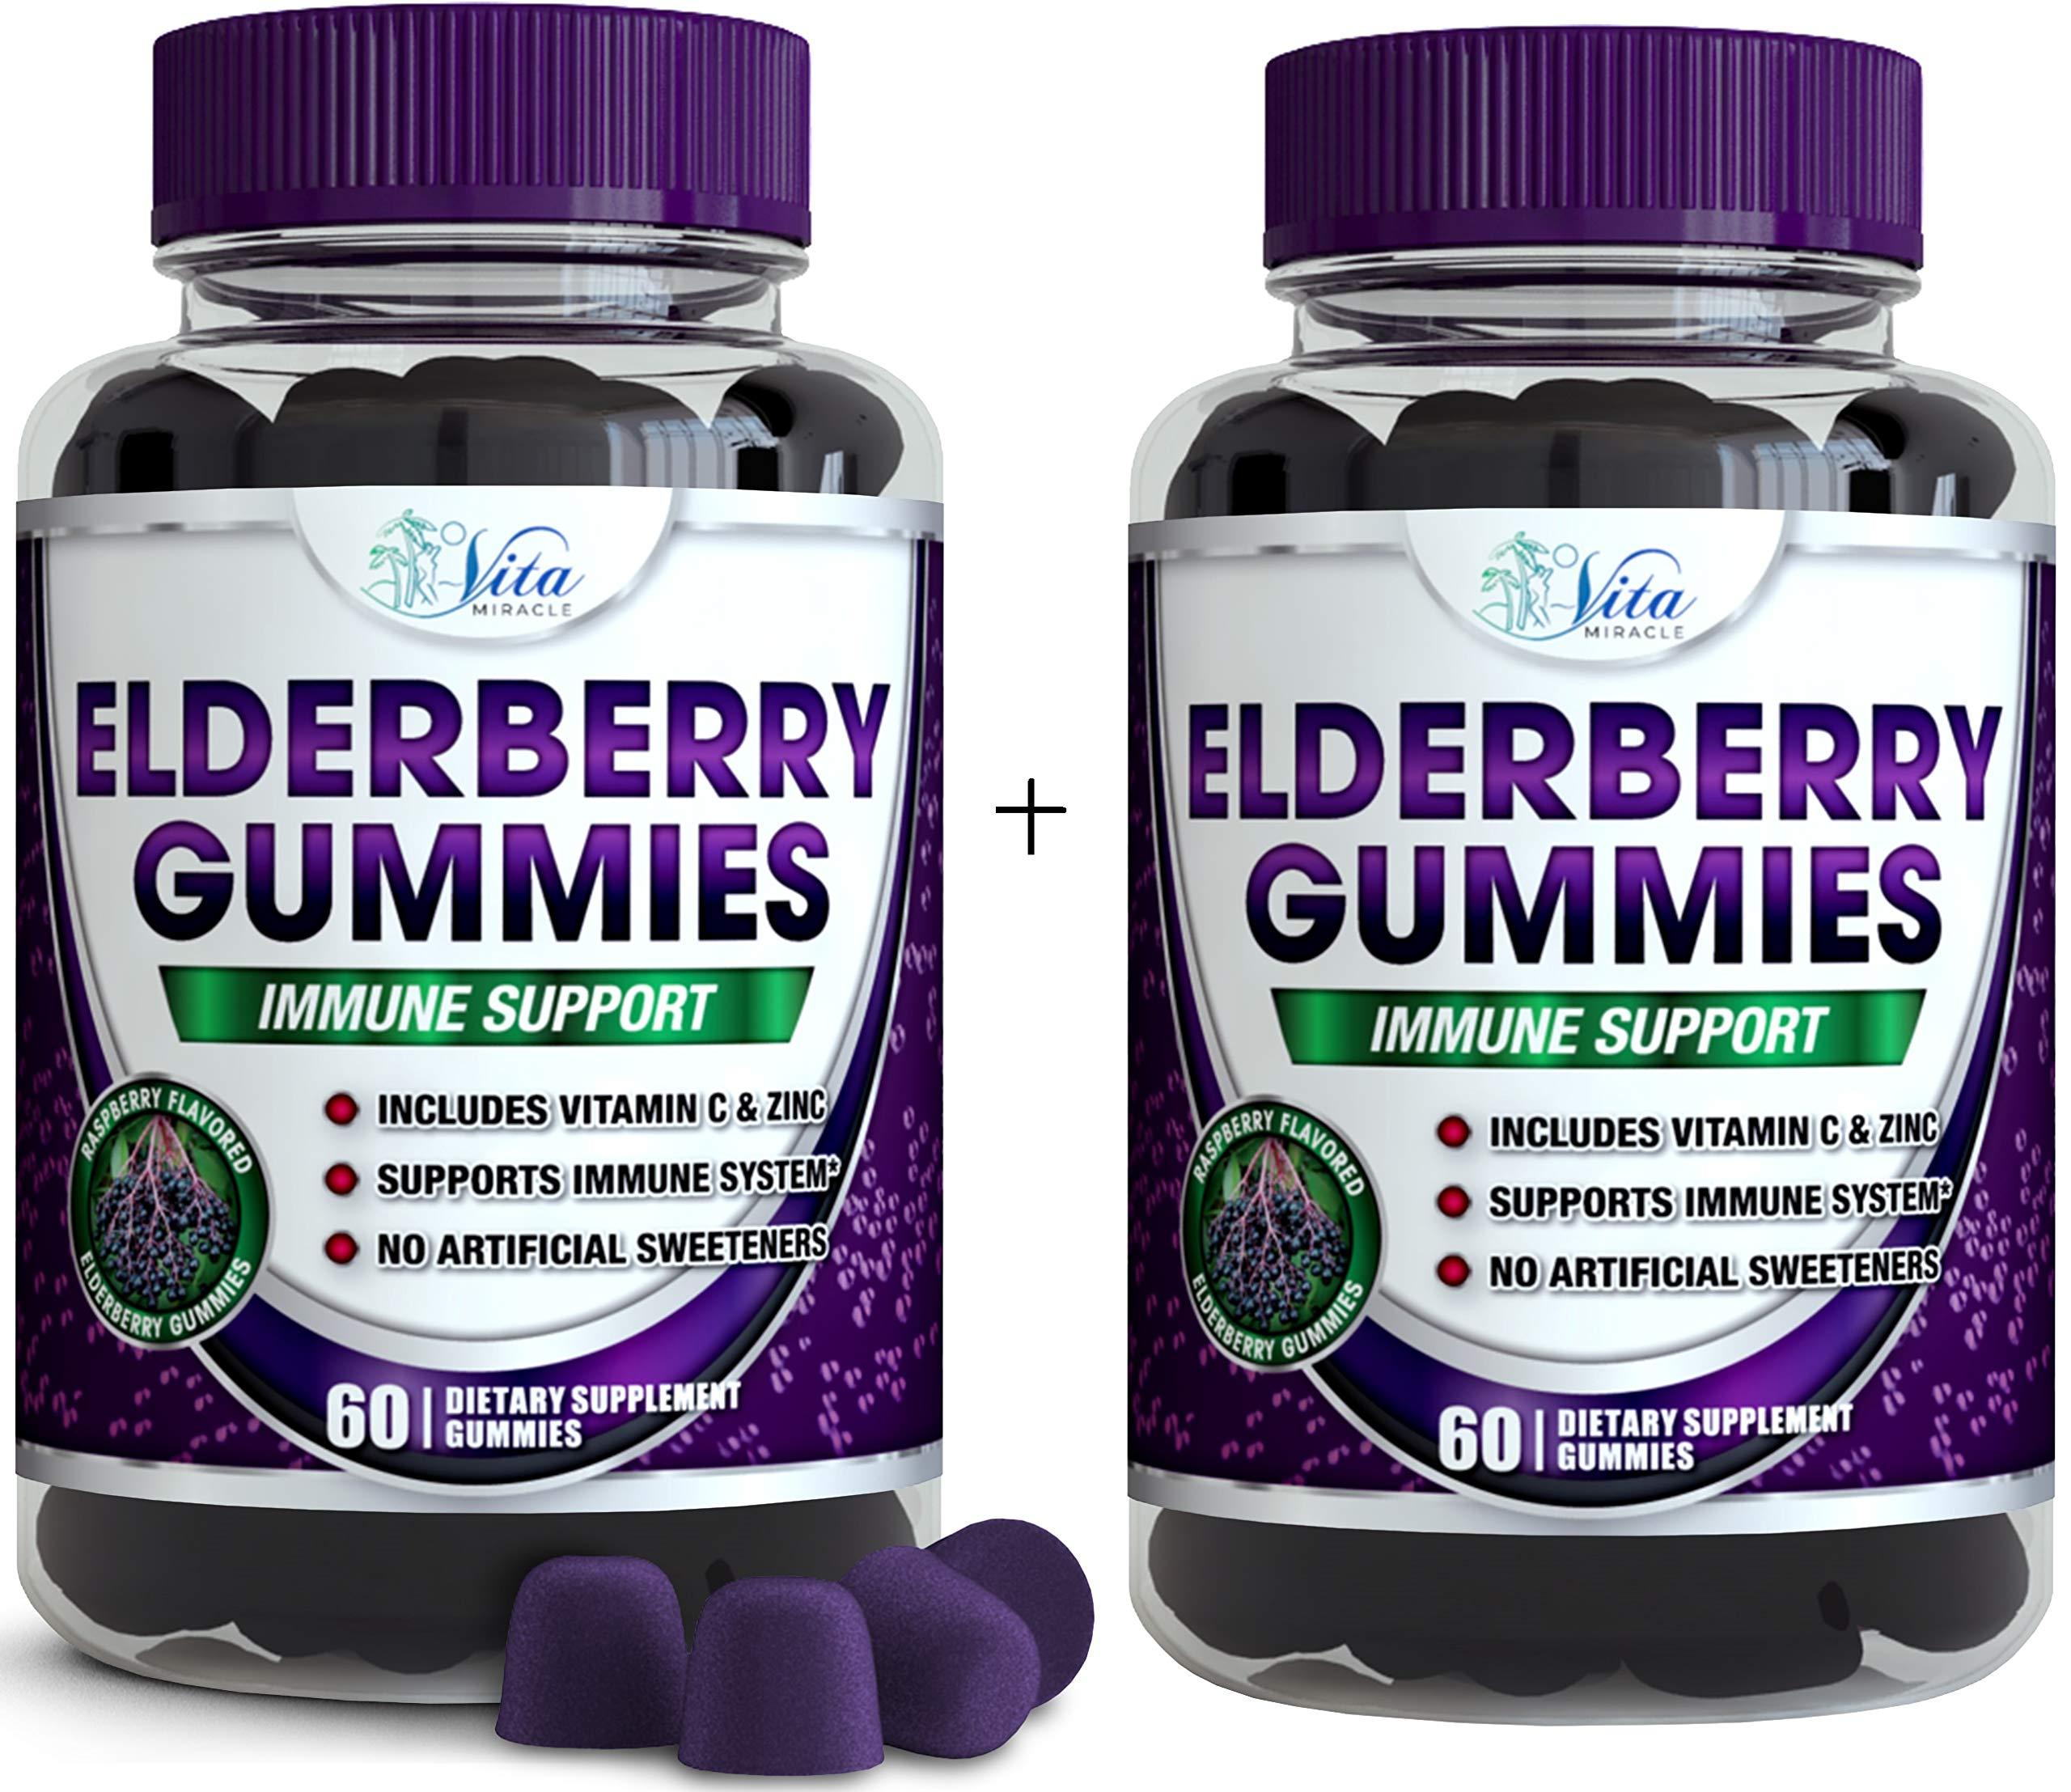 Elderberry Gummy Immune Support Kids - and Adults Cold and Flu Immune Support for Adults and Children Black Elderberry Gummy Organic Vegan Natural Formula (2 Pack)